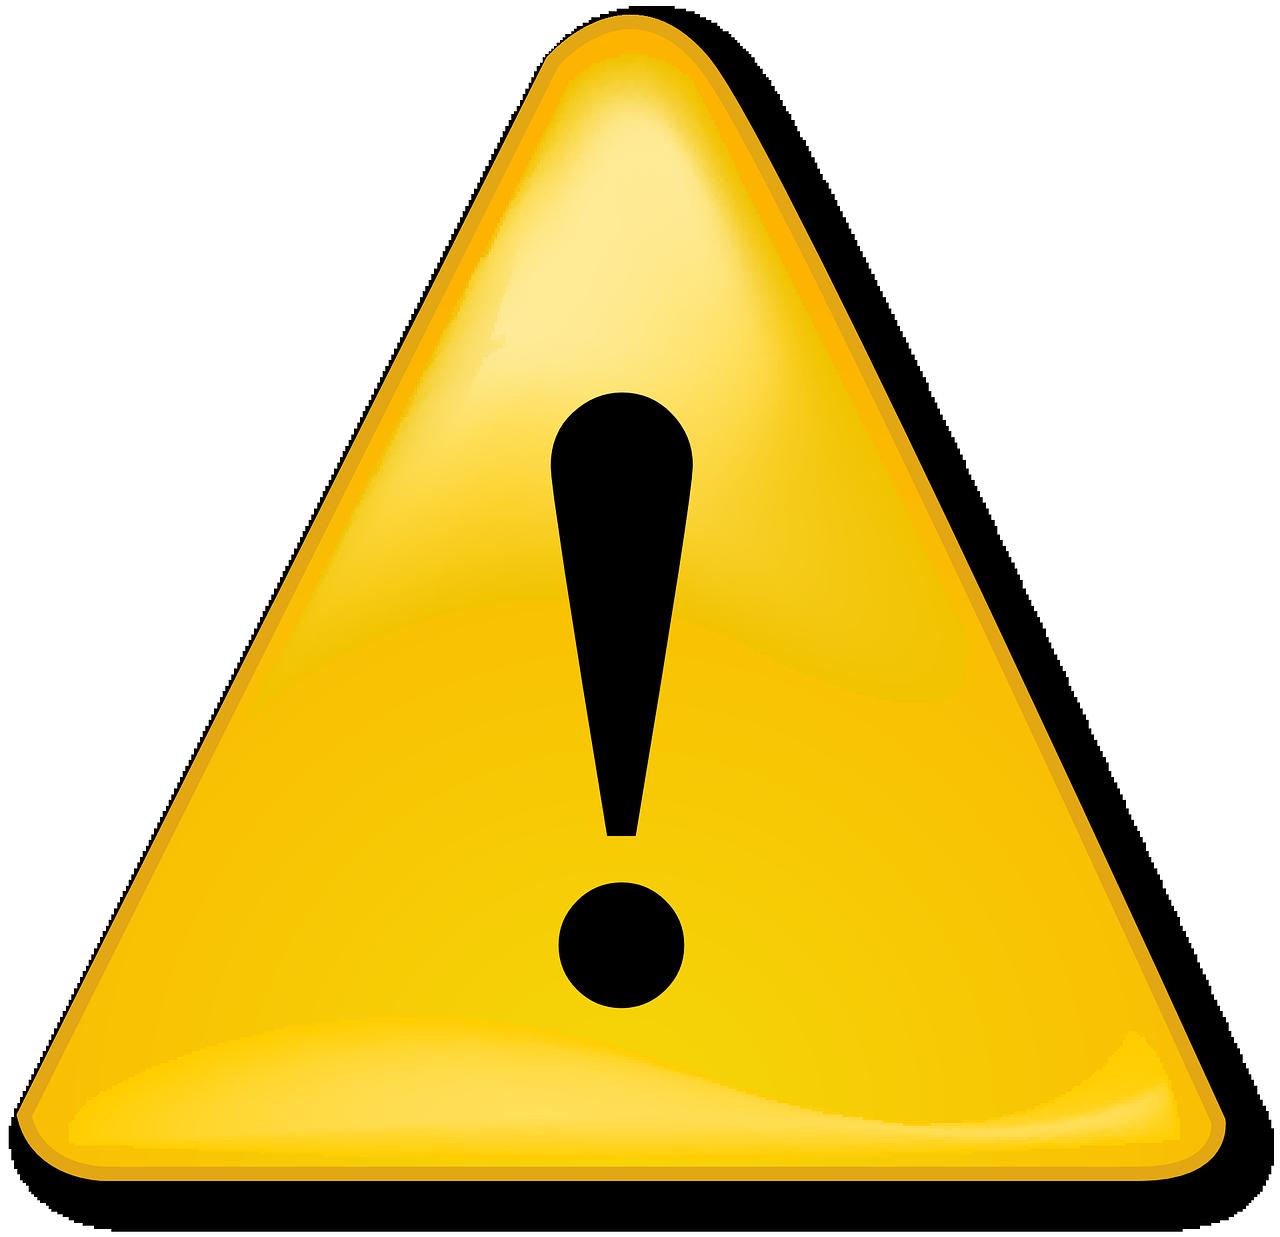 Free Image On Pixabay Warning Caution Alert Icon Point Noir